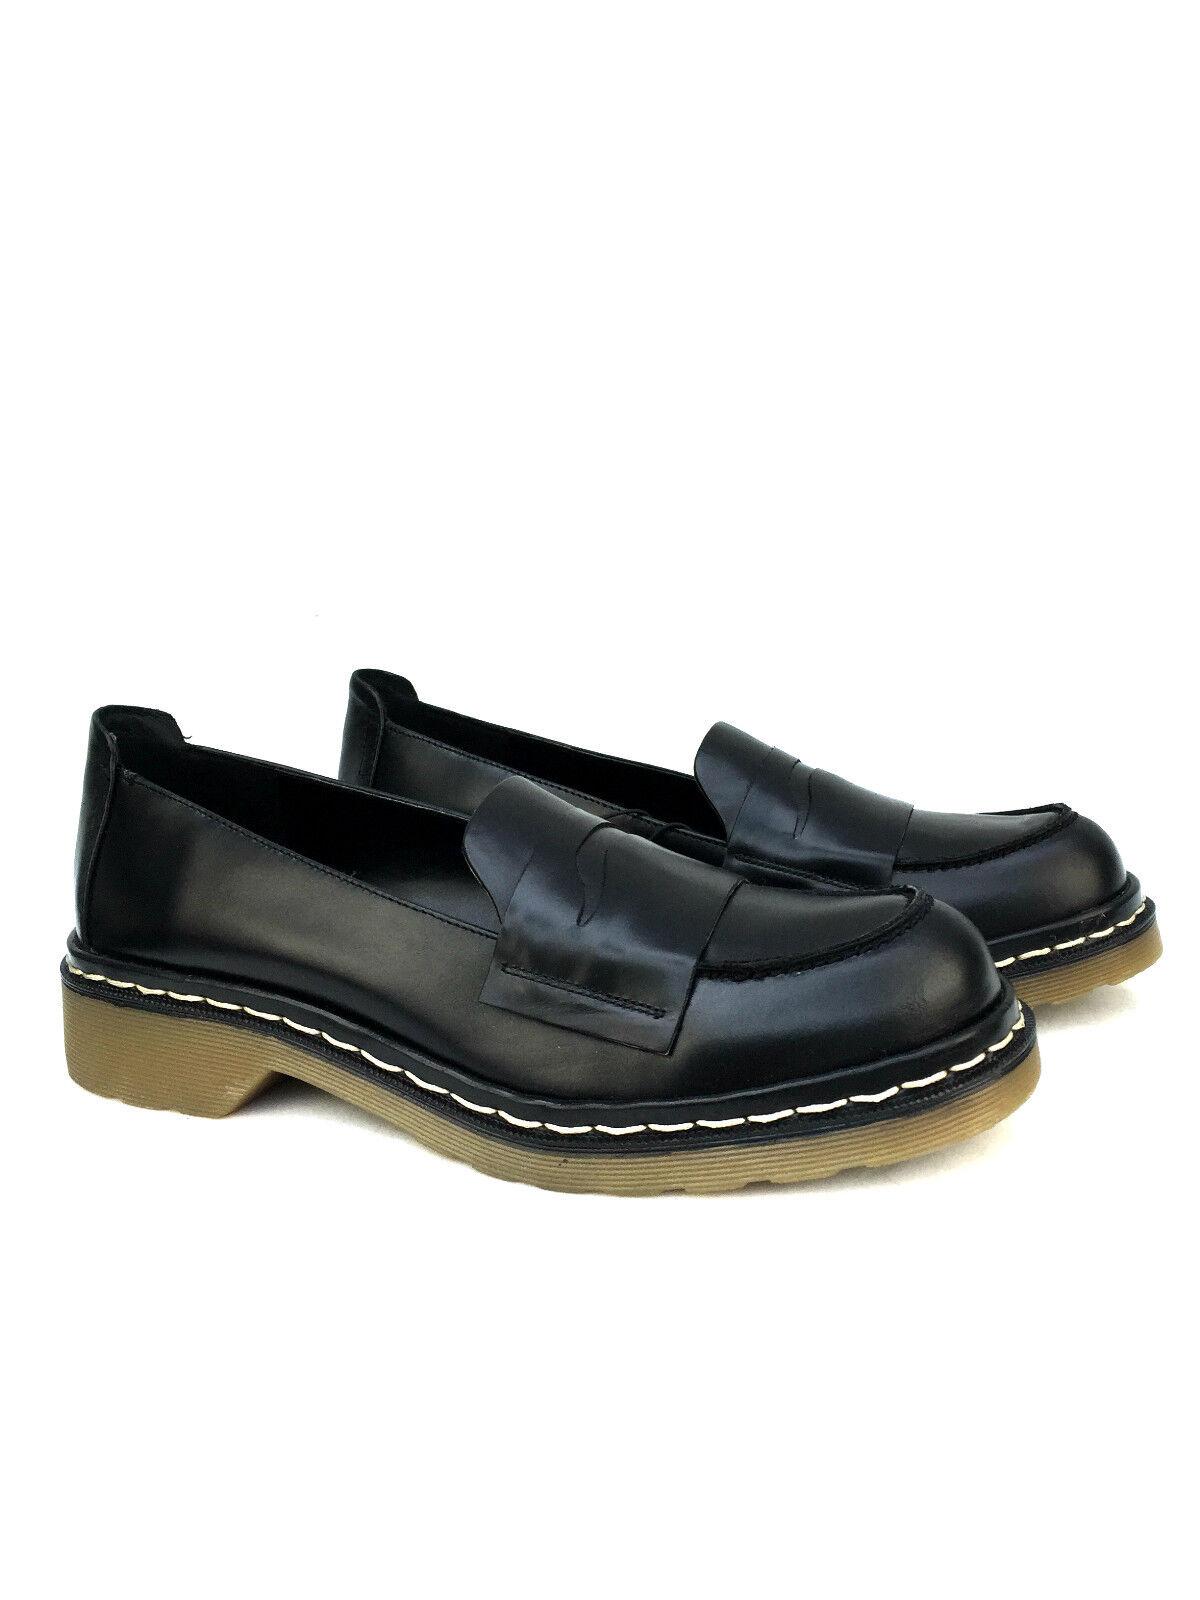 Zara schwarzes Leder Mokassins Schuhe flache Slipper Größe 37 39